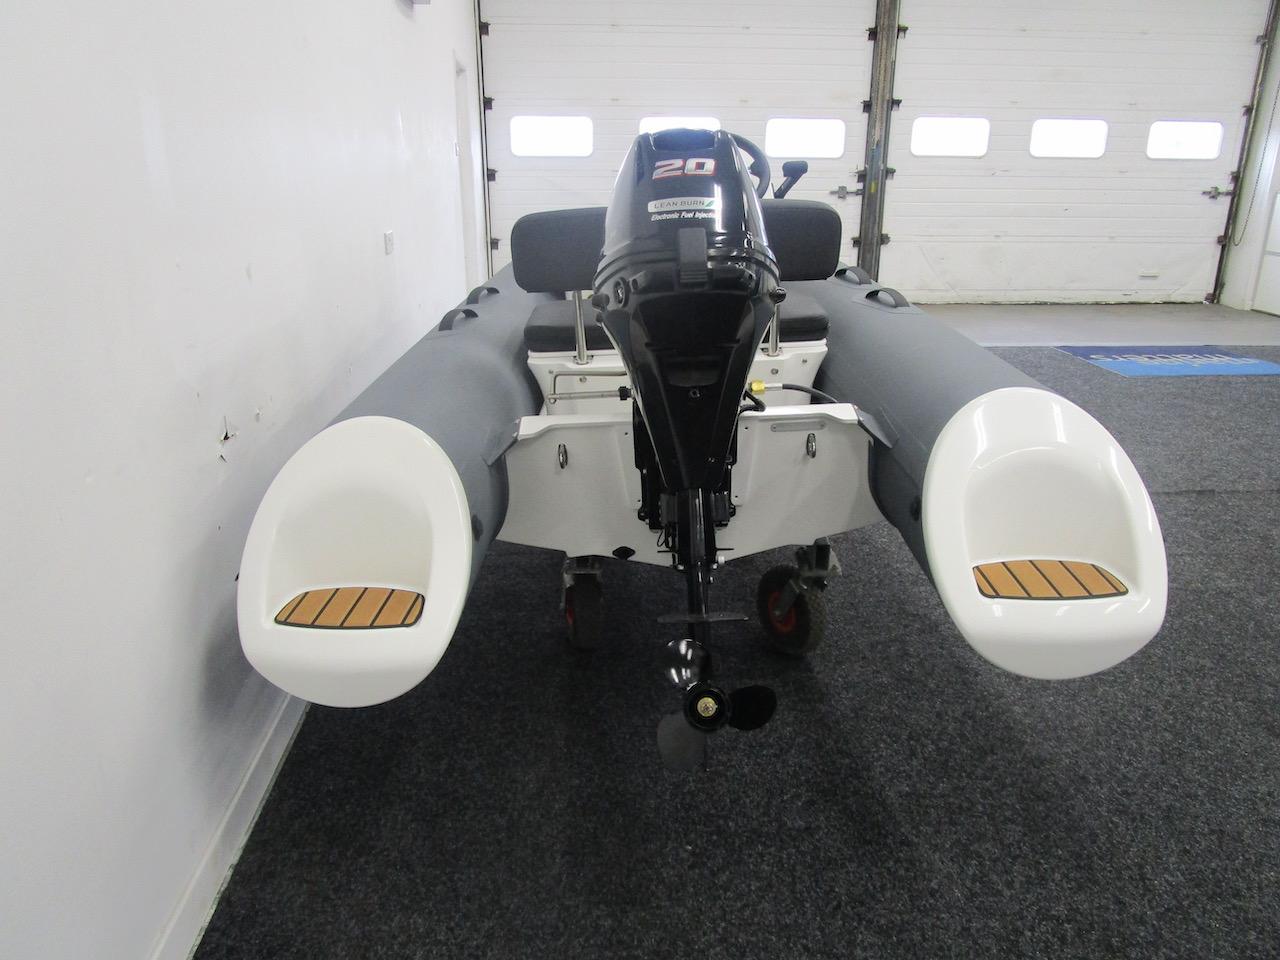 GRAND S300 RIB rear view